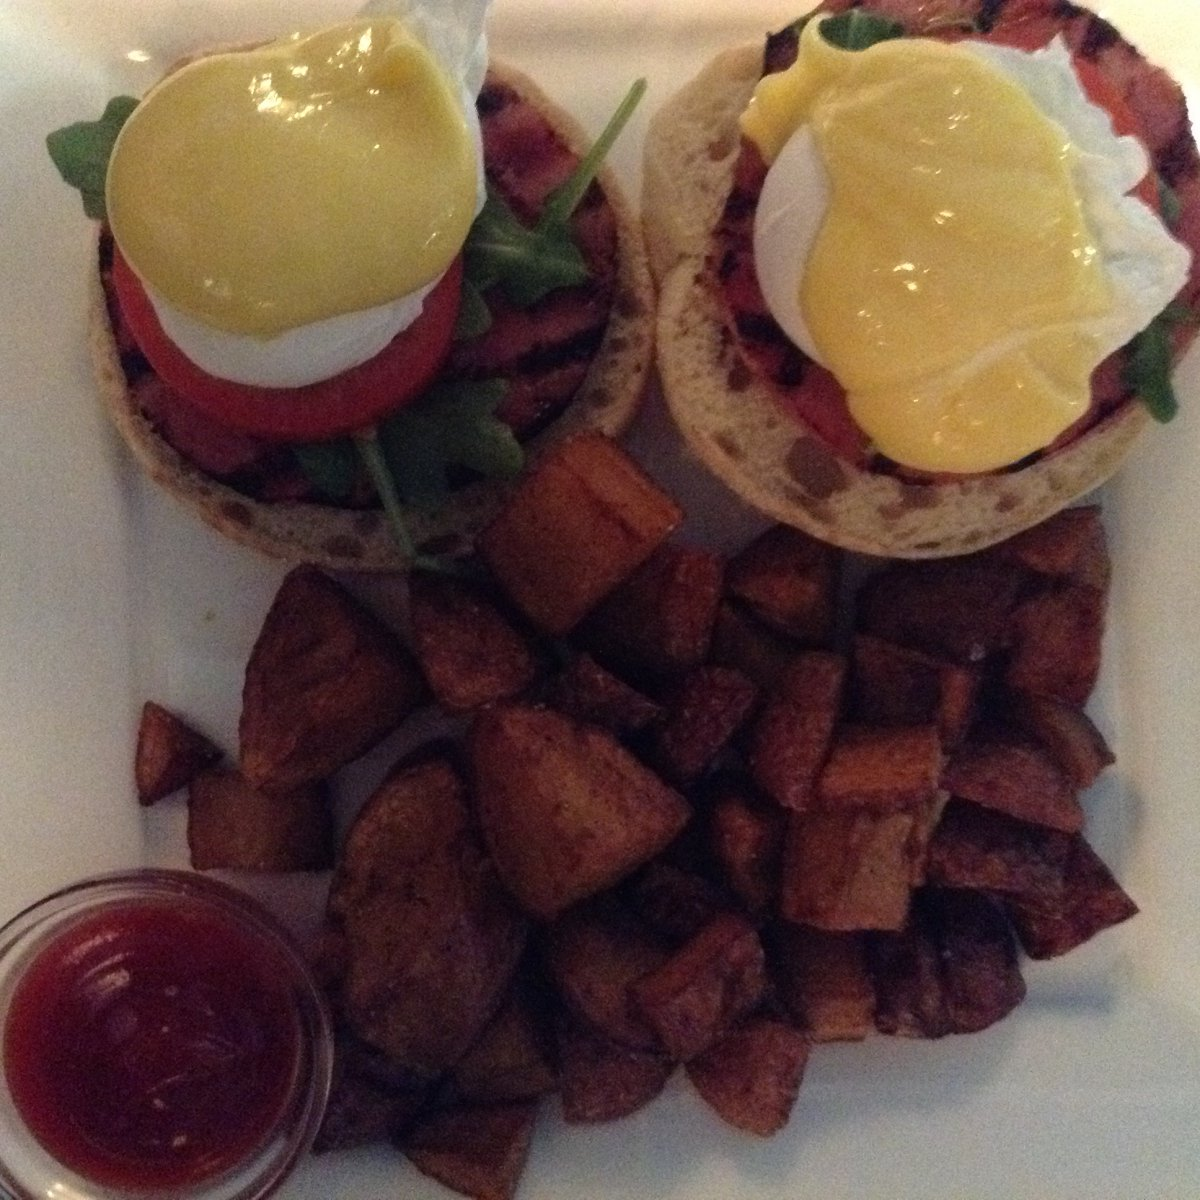 On The Menu at Buckley\'s: Eggs hollandaise